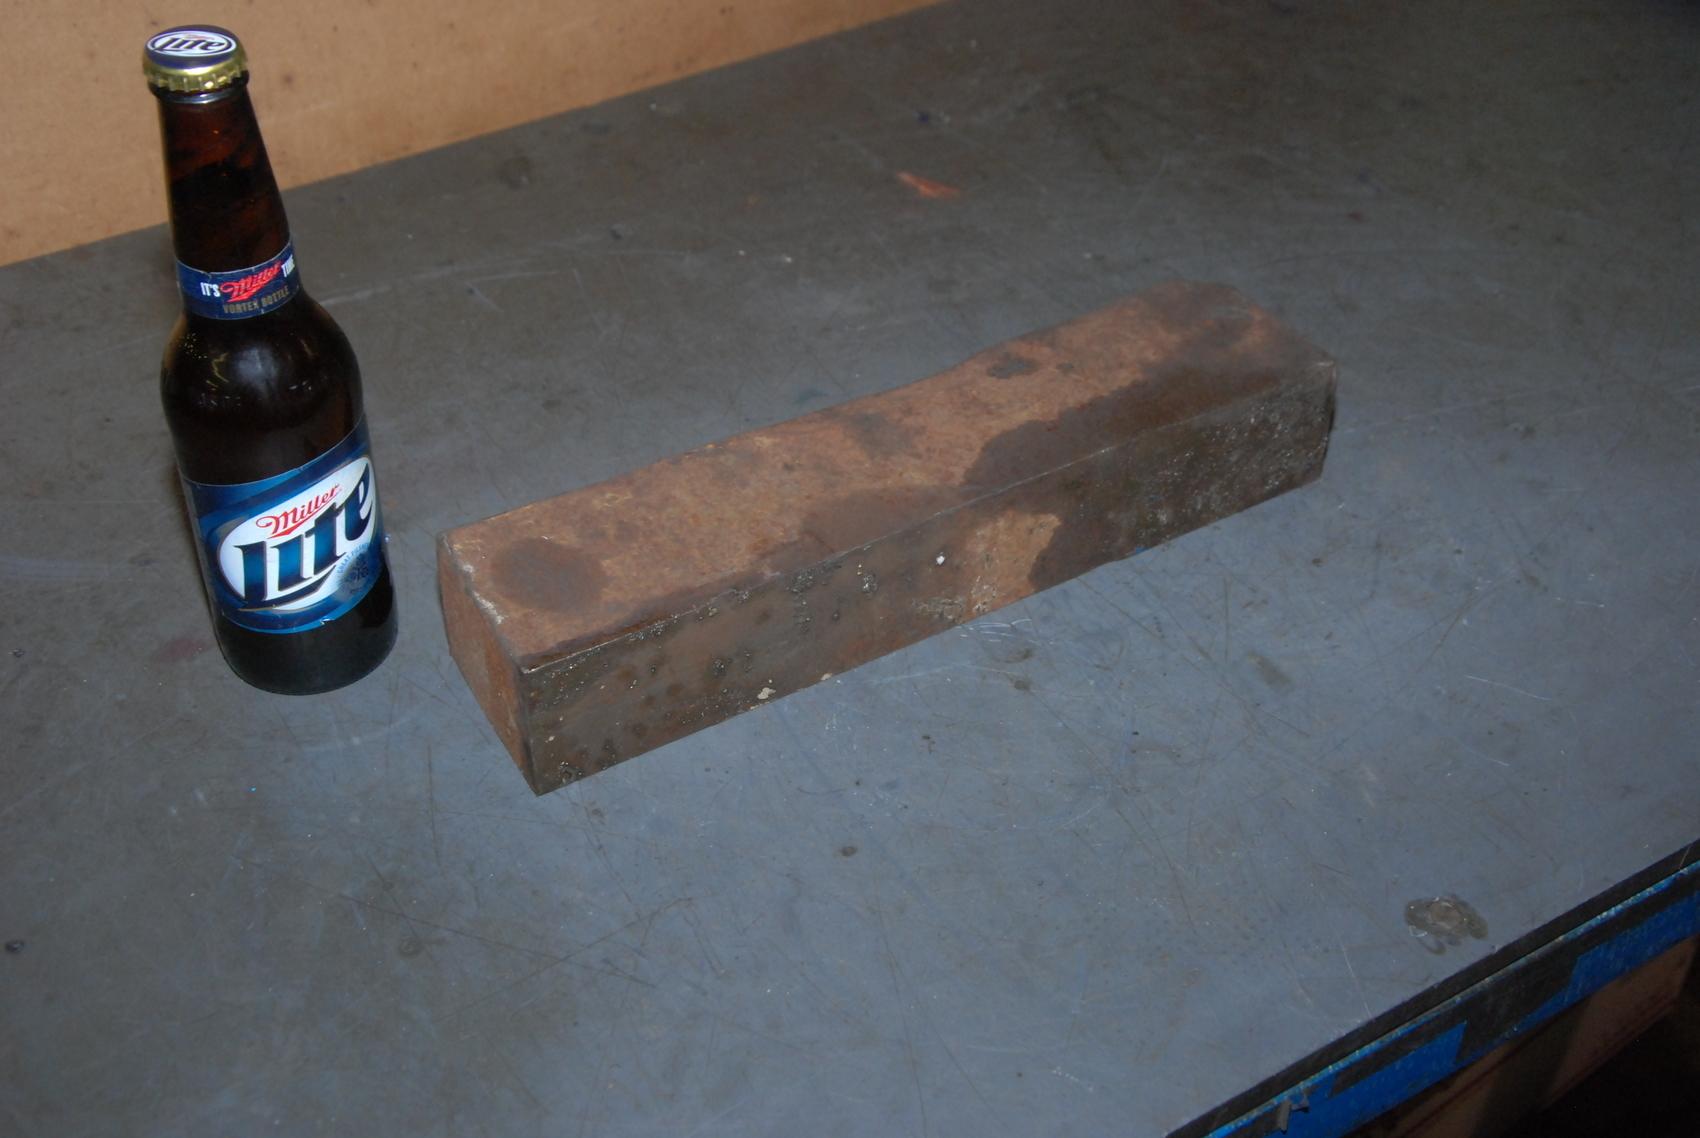 ONE steel Rectangular Bar for blacksmith anvil,23 lbs